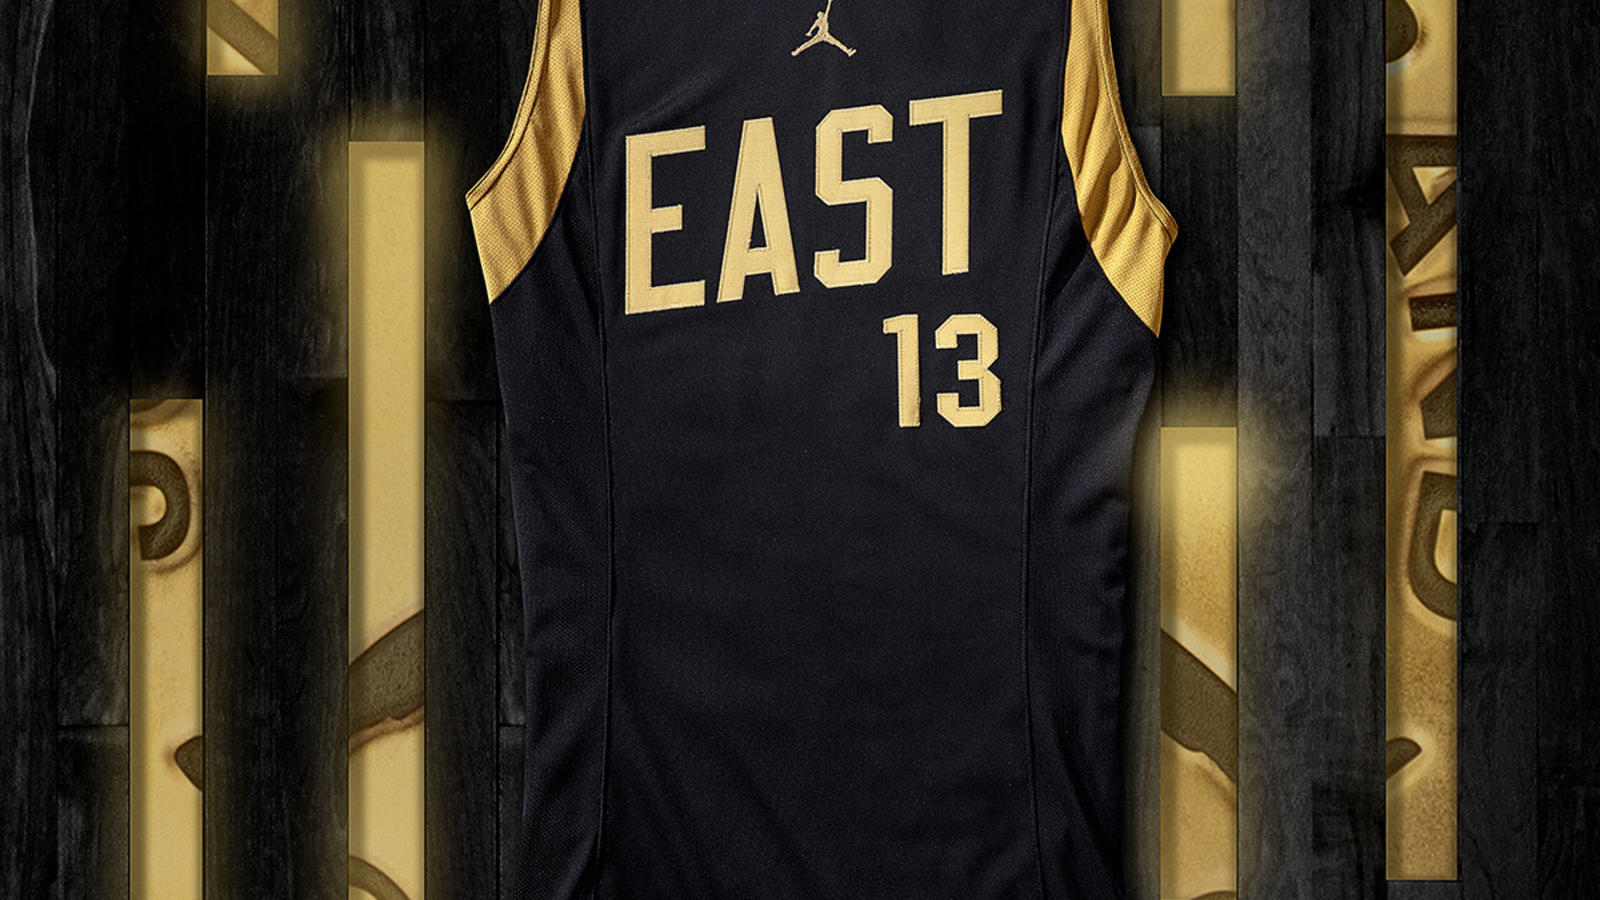 jordan_brand_classic_east_jersey